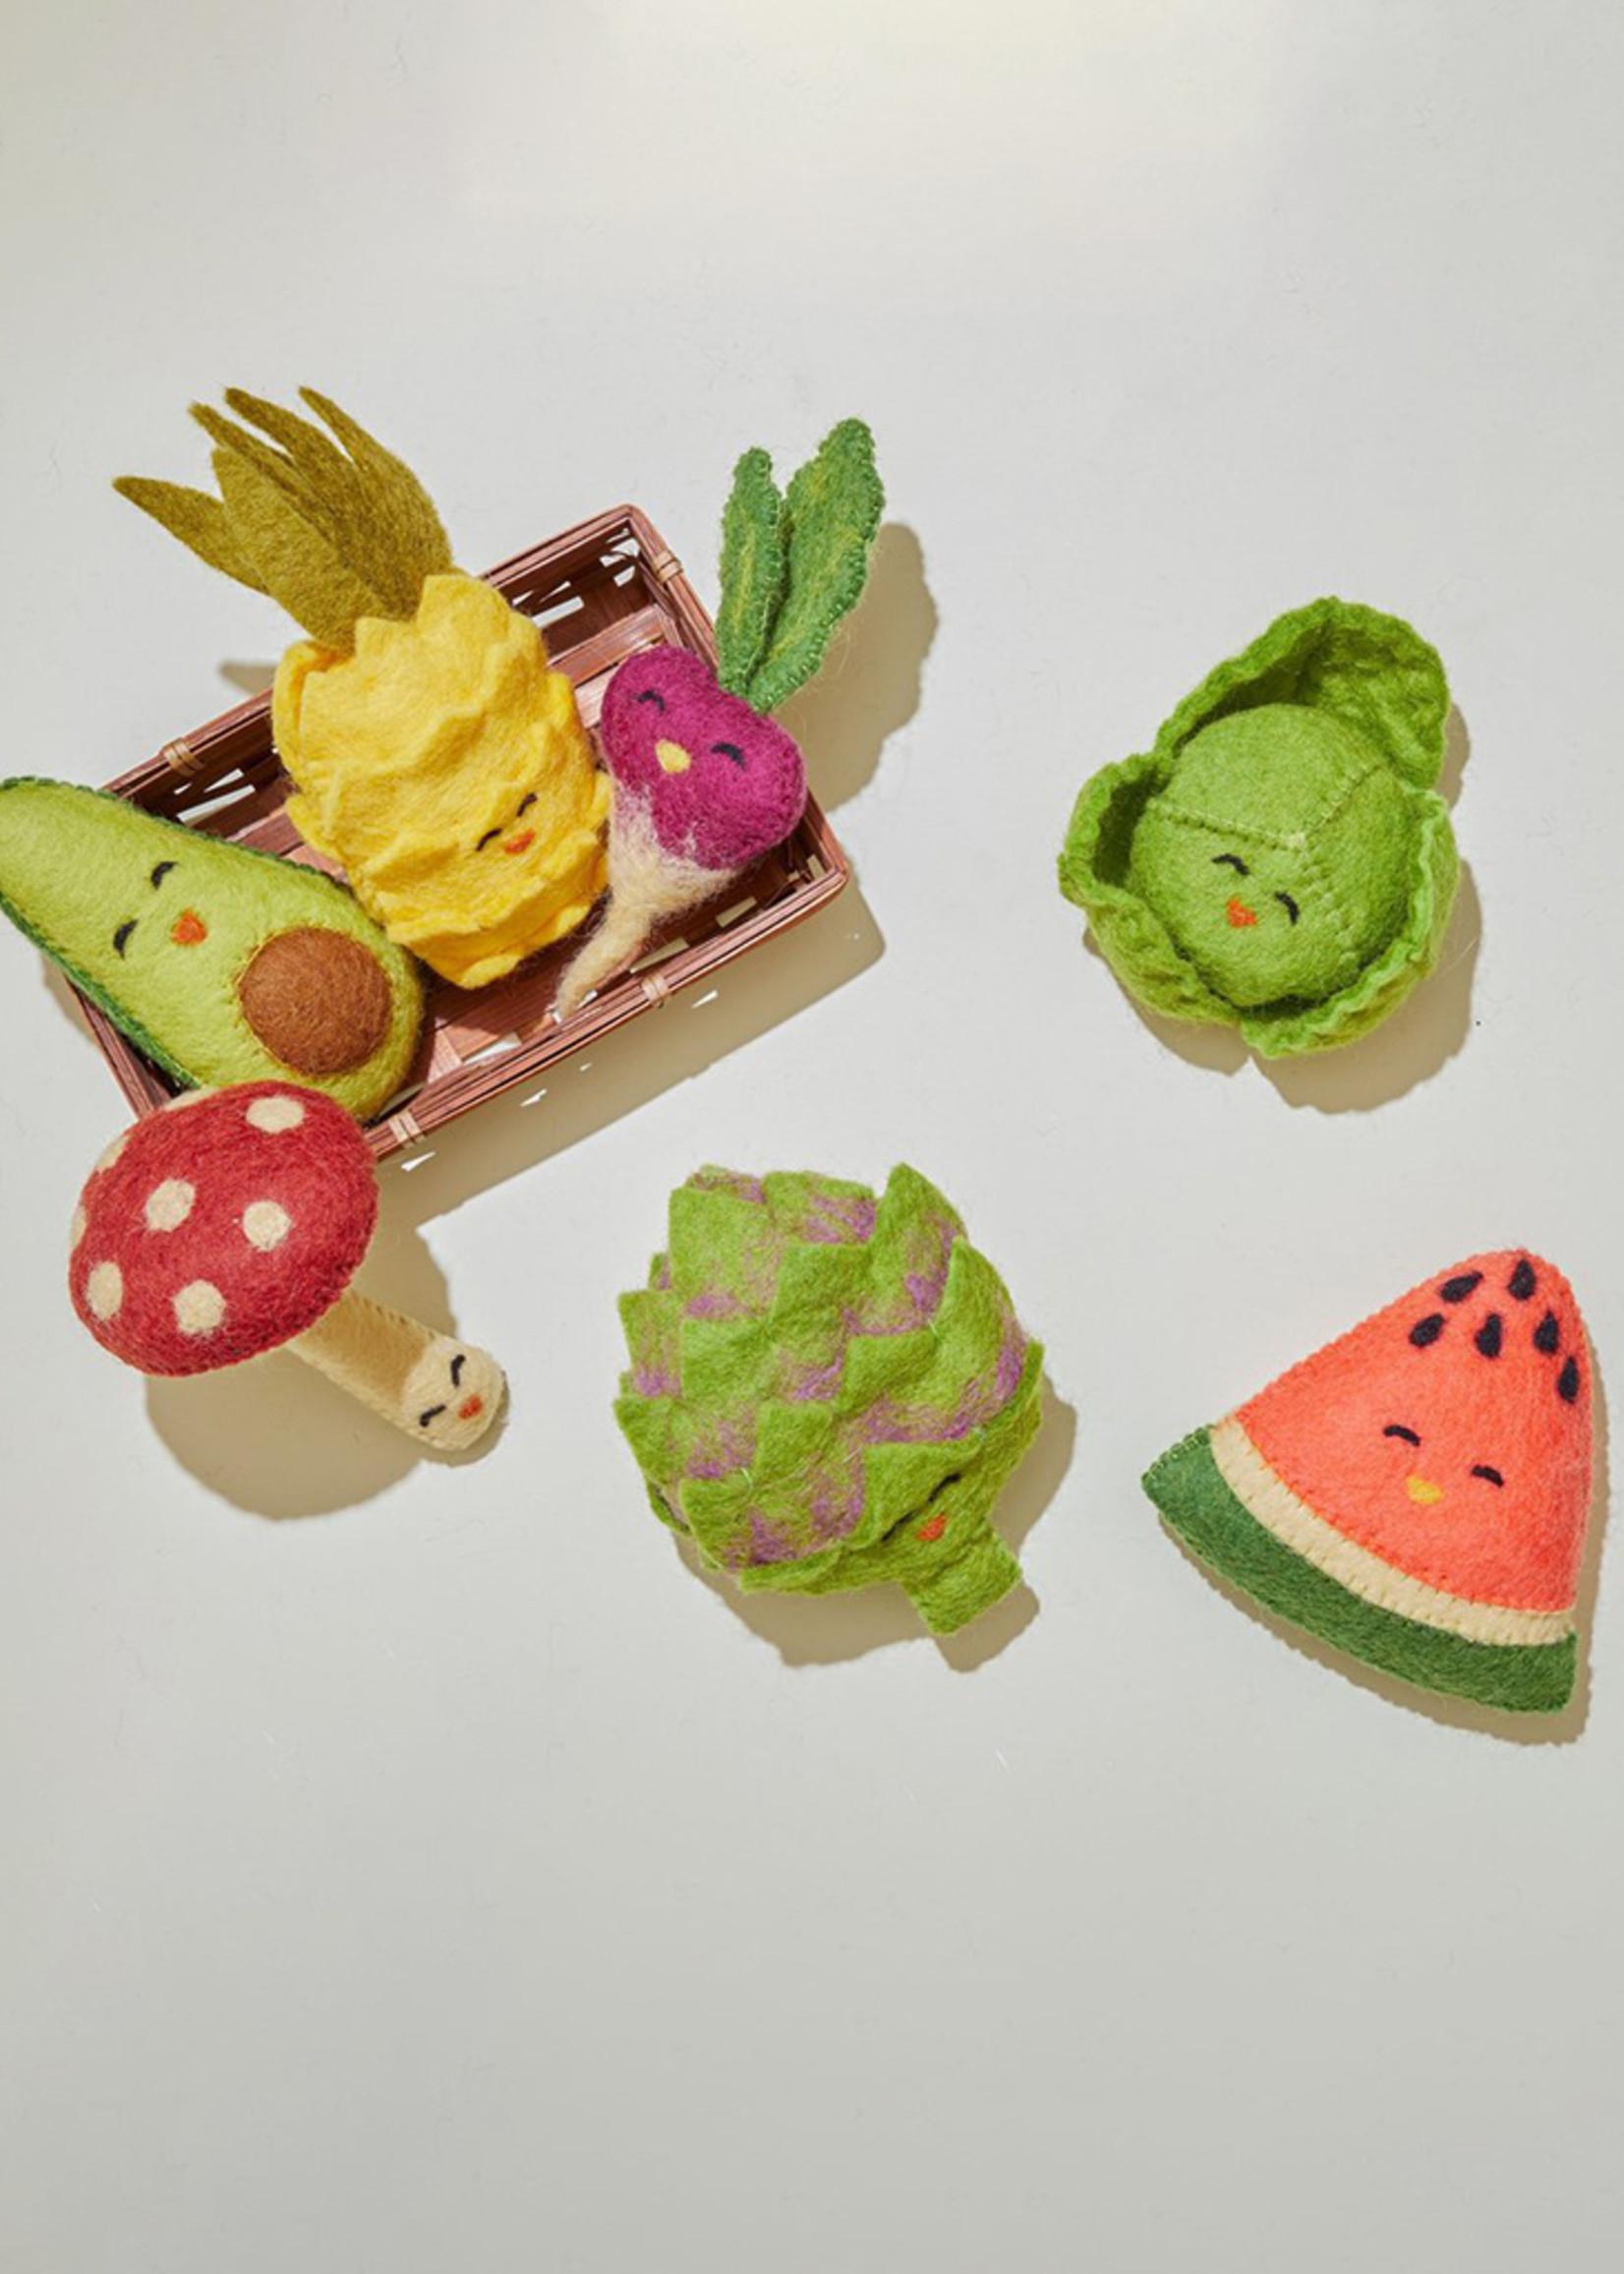 Global Goods Partners Felt Avocado Toy